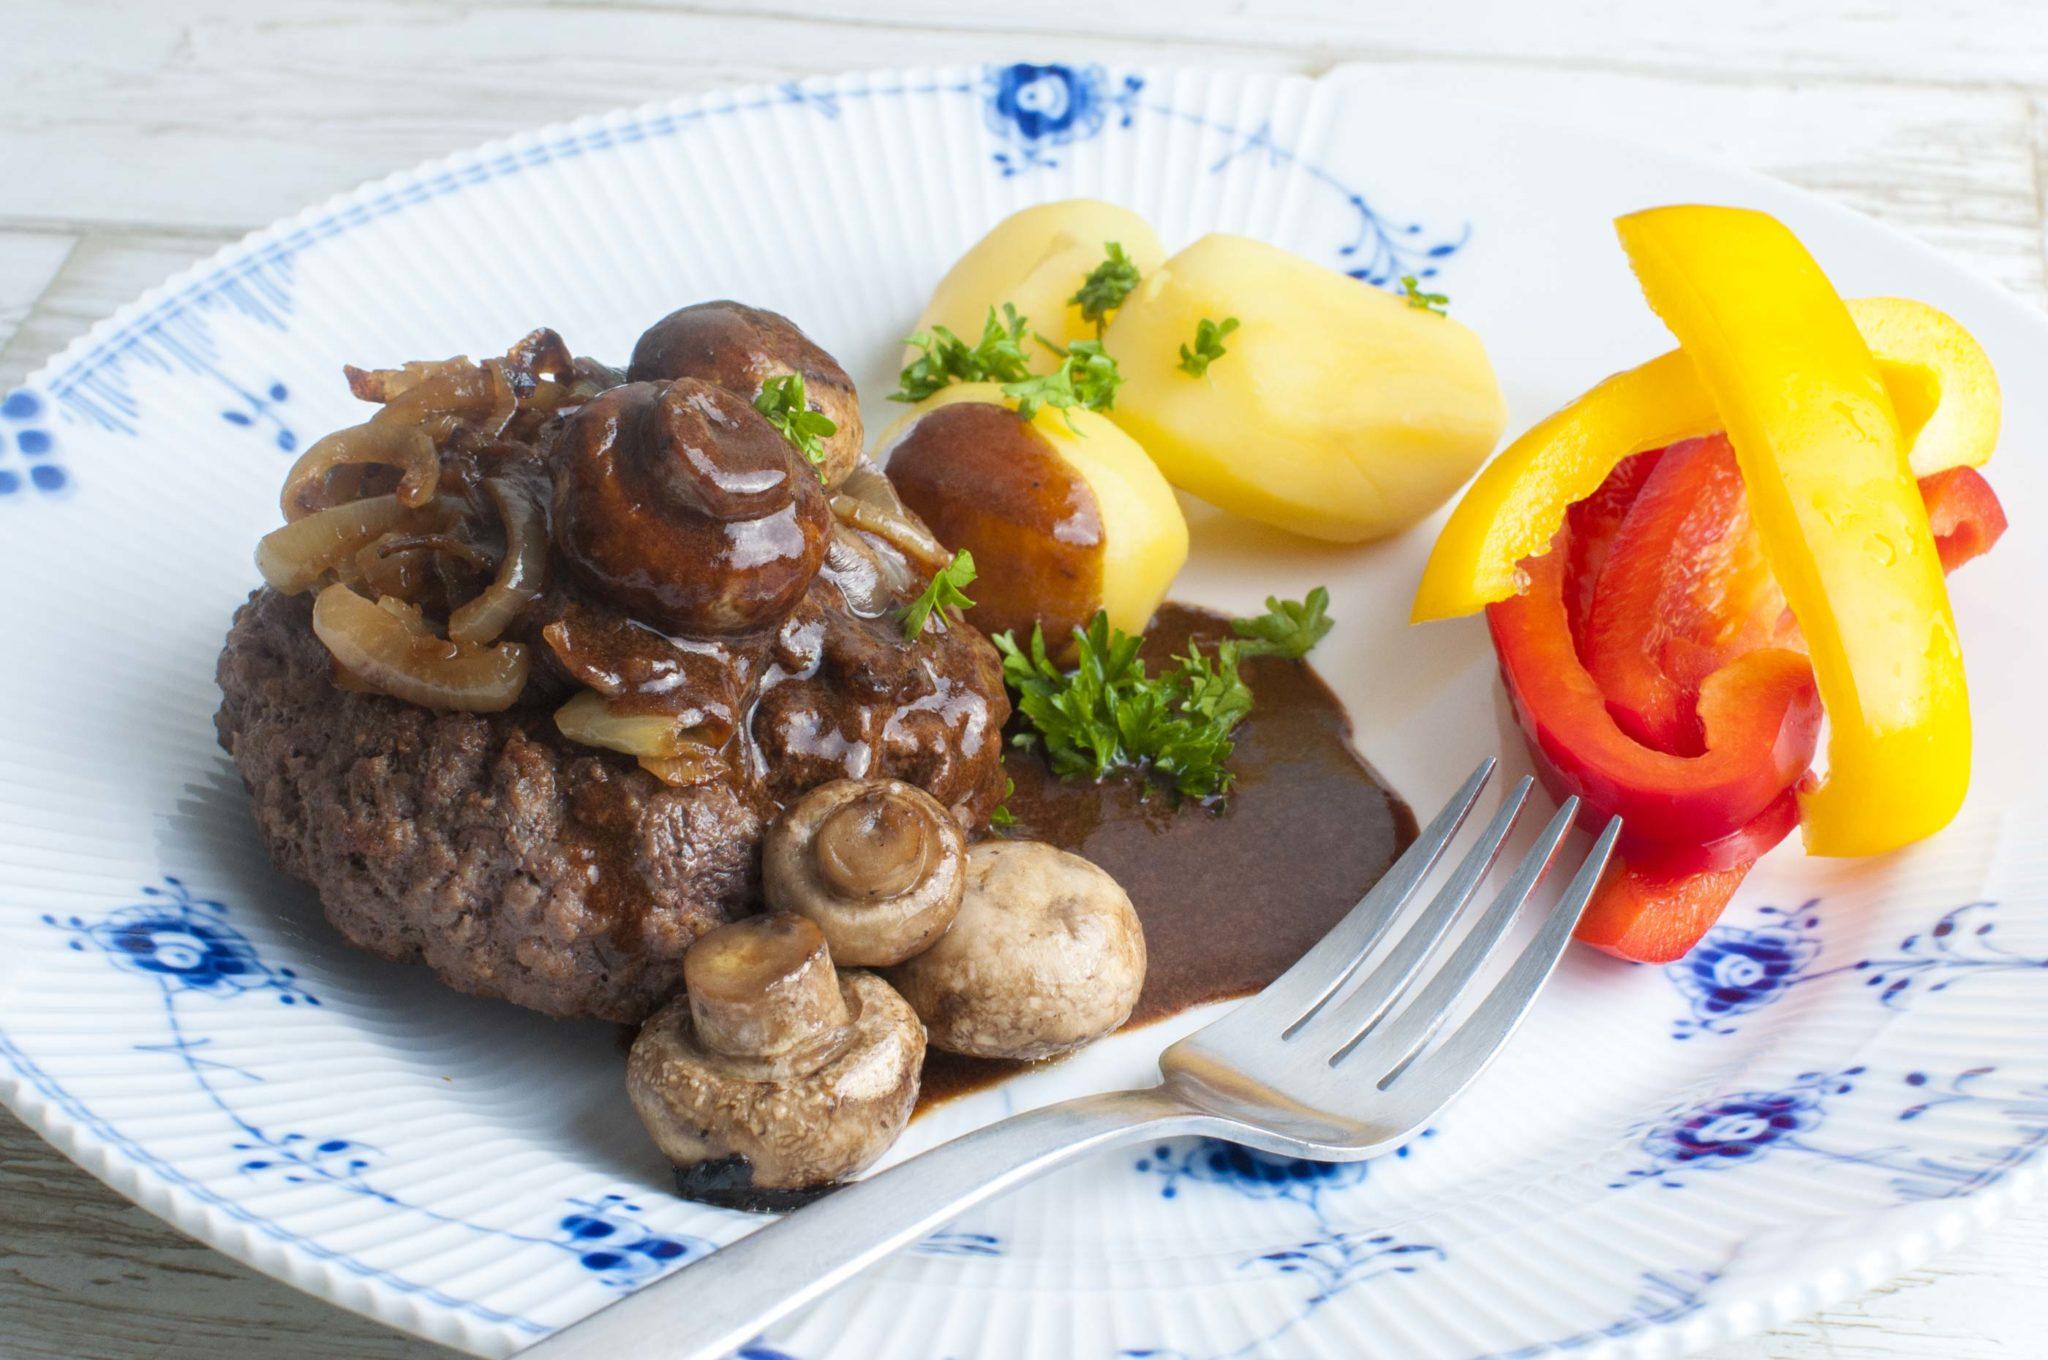 Hakkebøf med bløde løg, brun sovs og kartofler - en klassiker!